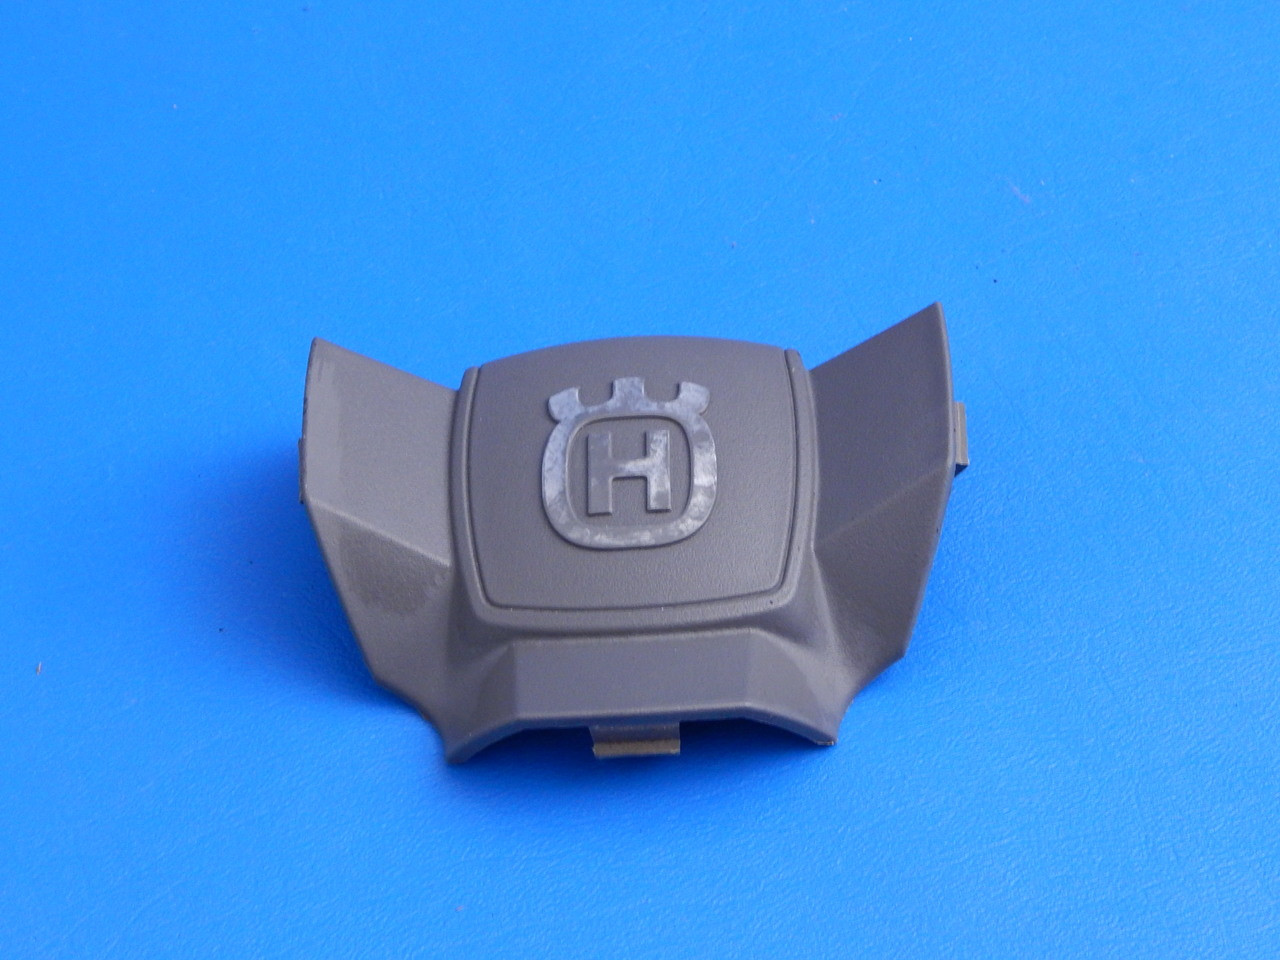 husqvarna yth2348 riding lawn mower steering wheel insert cap 532415987 ice cold beer appliance parts [ 1280 x 960 Pixel ]